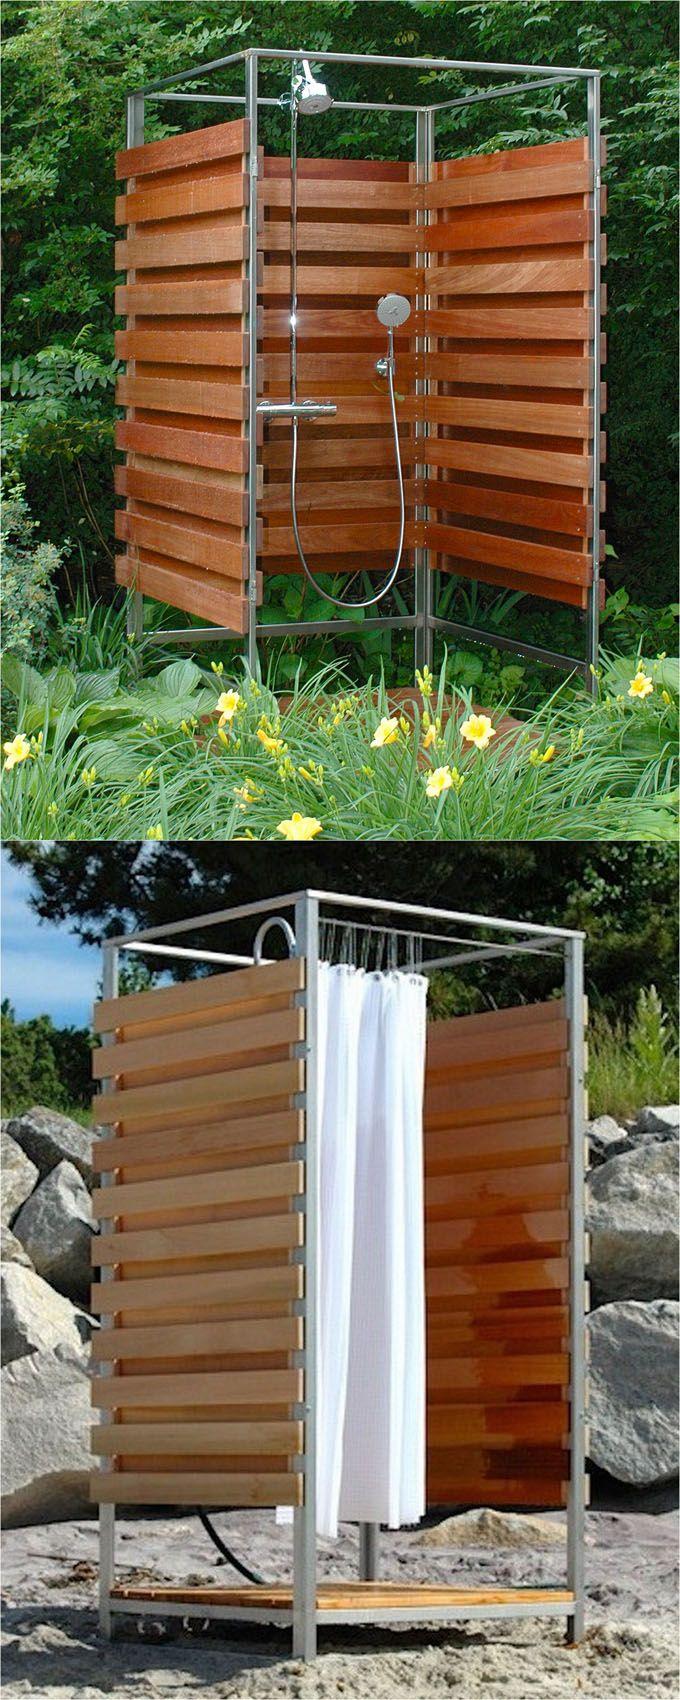 How to make an outdoor shower - 16 Diy Outdoor Shower Ideas